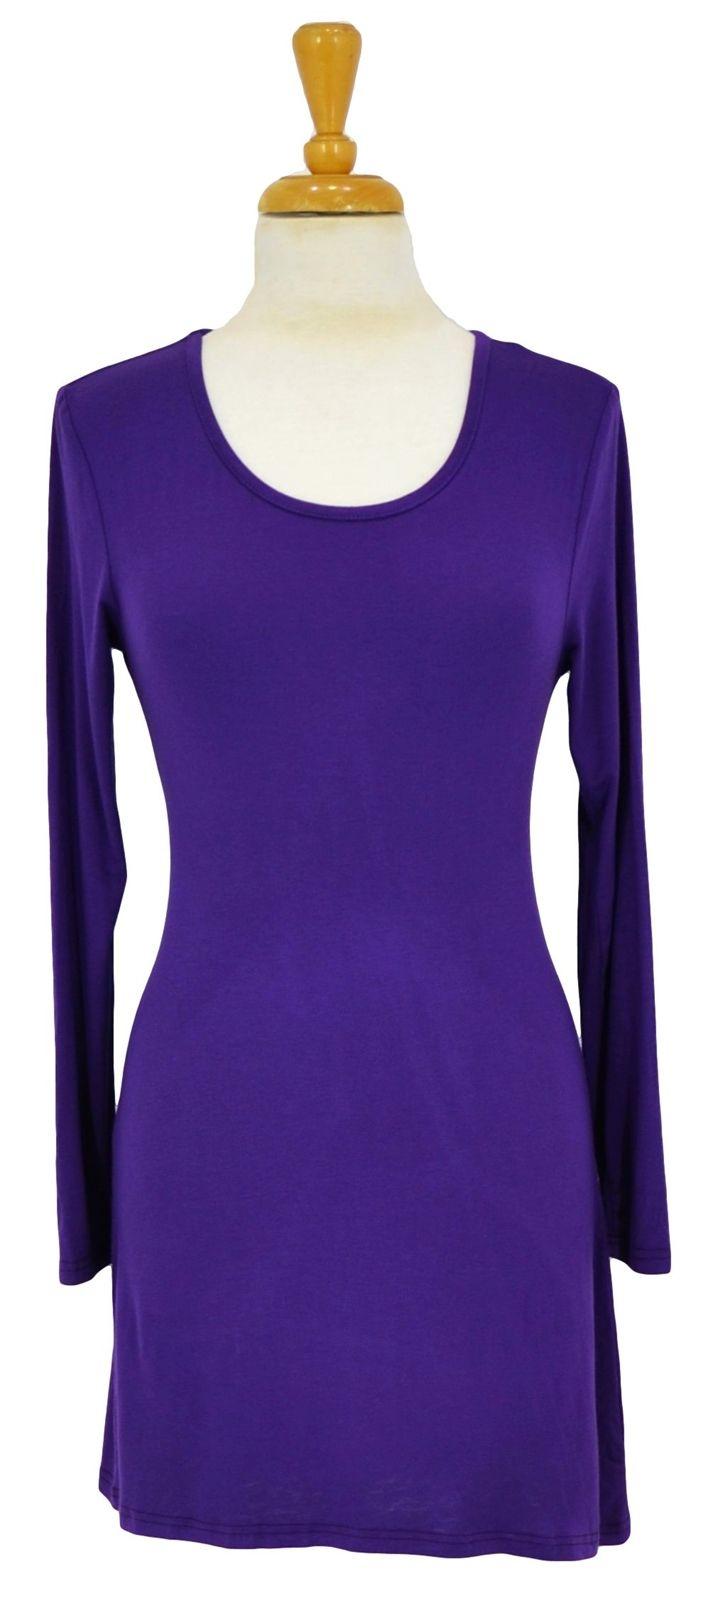 Purple Full Sleeve Basic ~ Best selection of Tunics & matching accessories ~ Flat postage worldwide ~ Petite to Plus sizes ~ www.ilovetunics.com